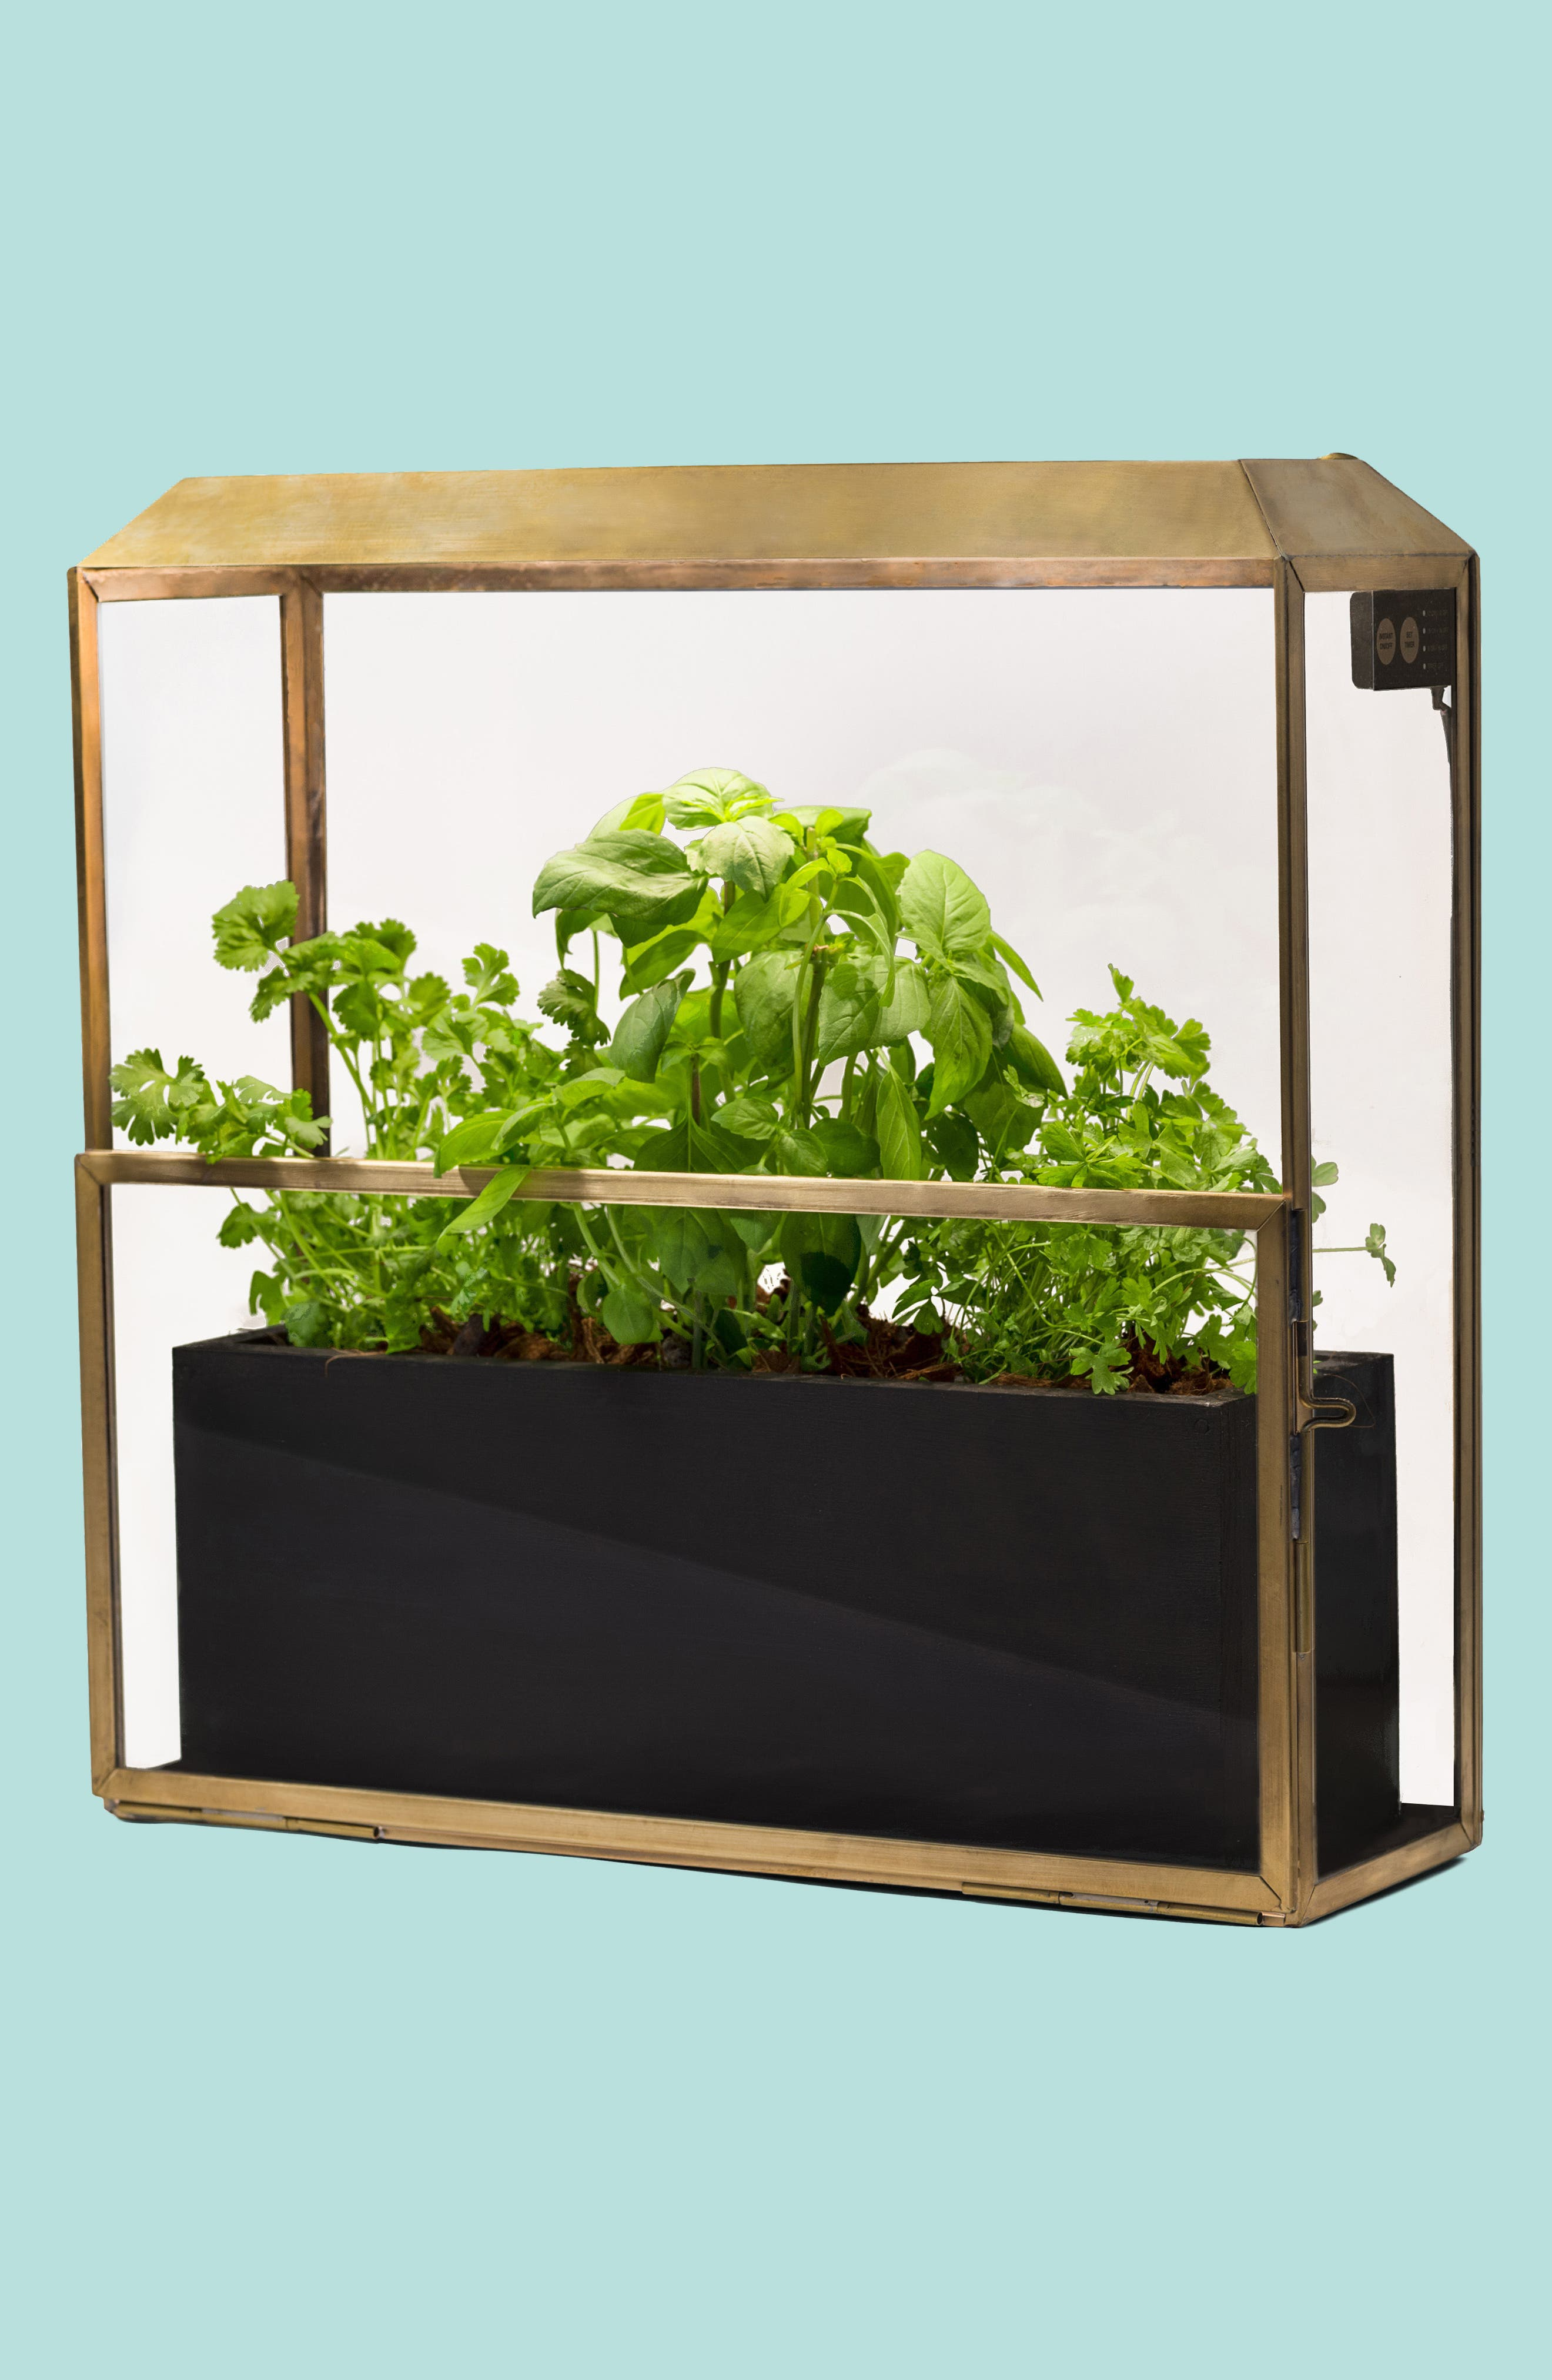 Growhouse Greenhouse & Growlight,                         Main,                         color, Brass N Glass